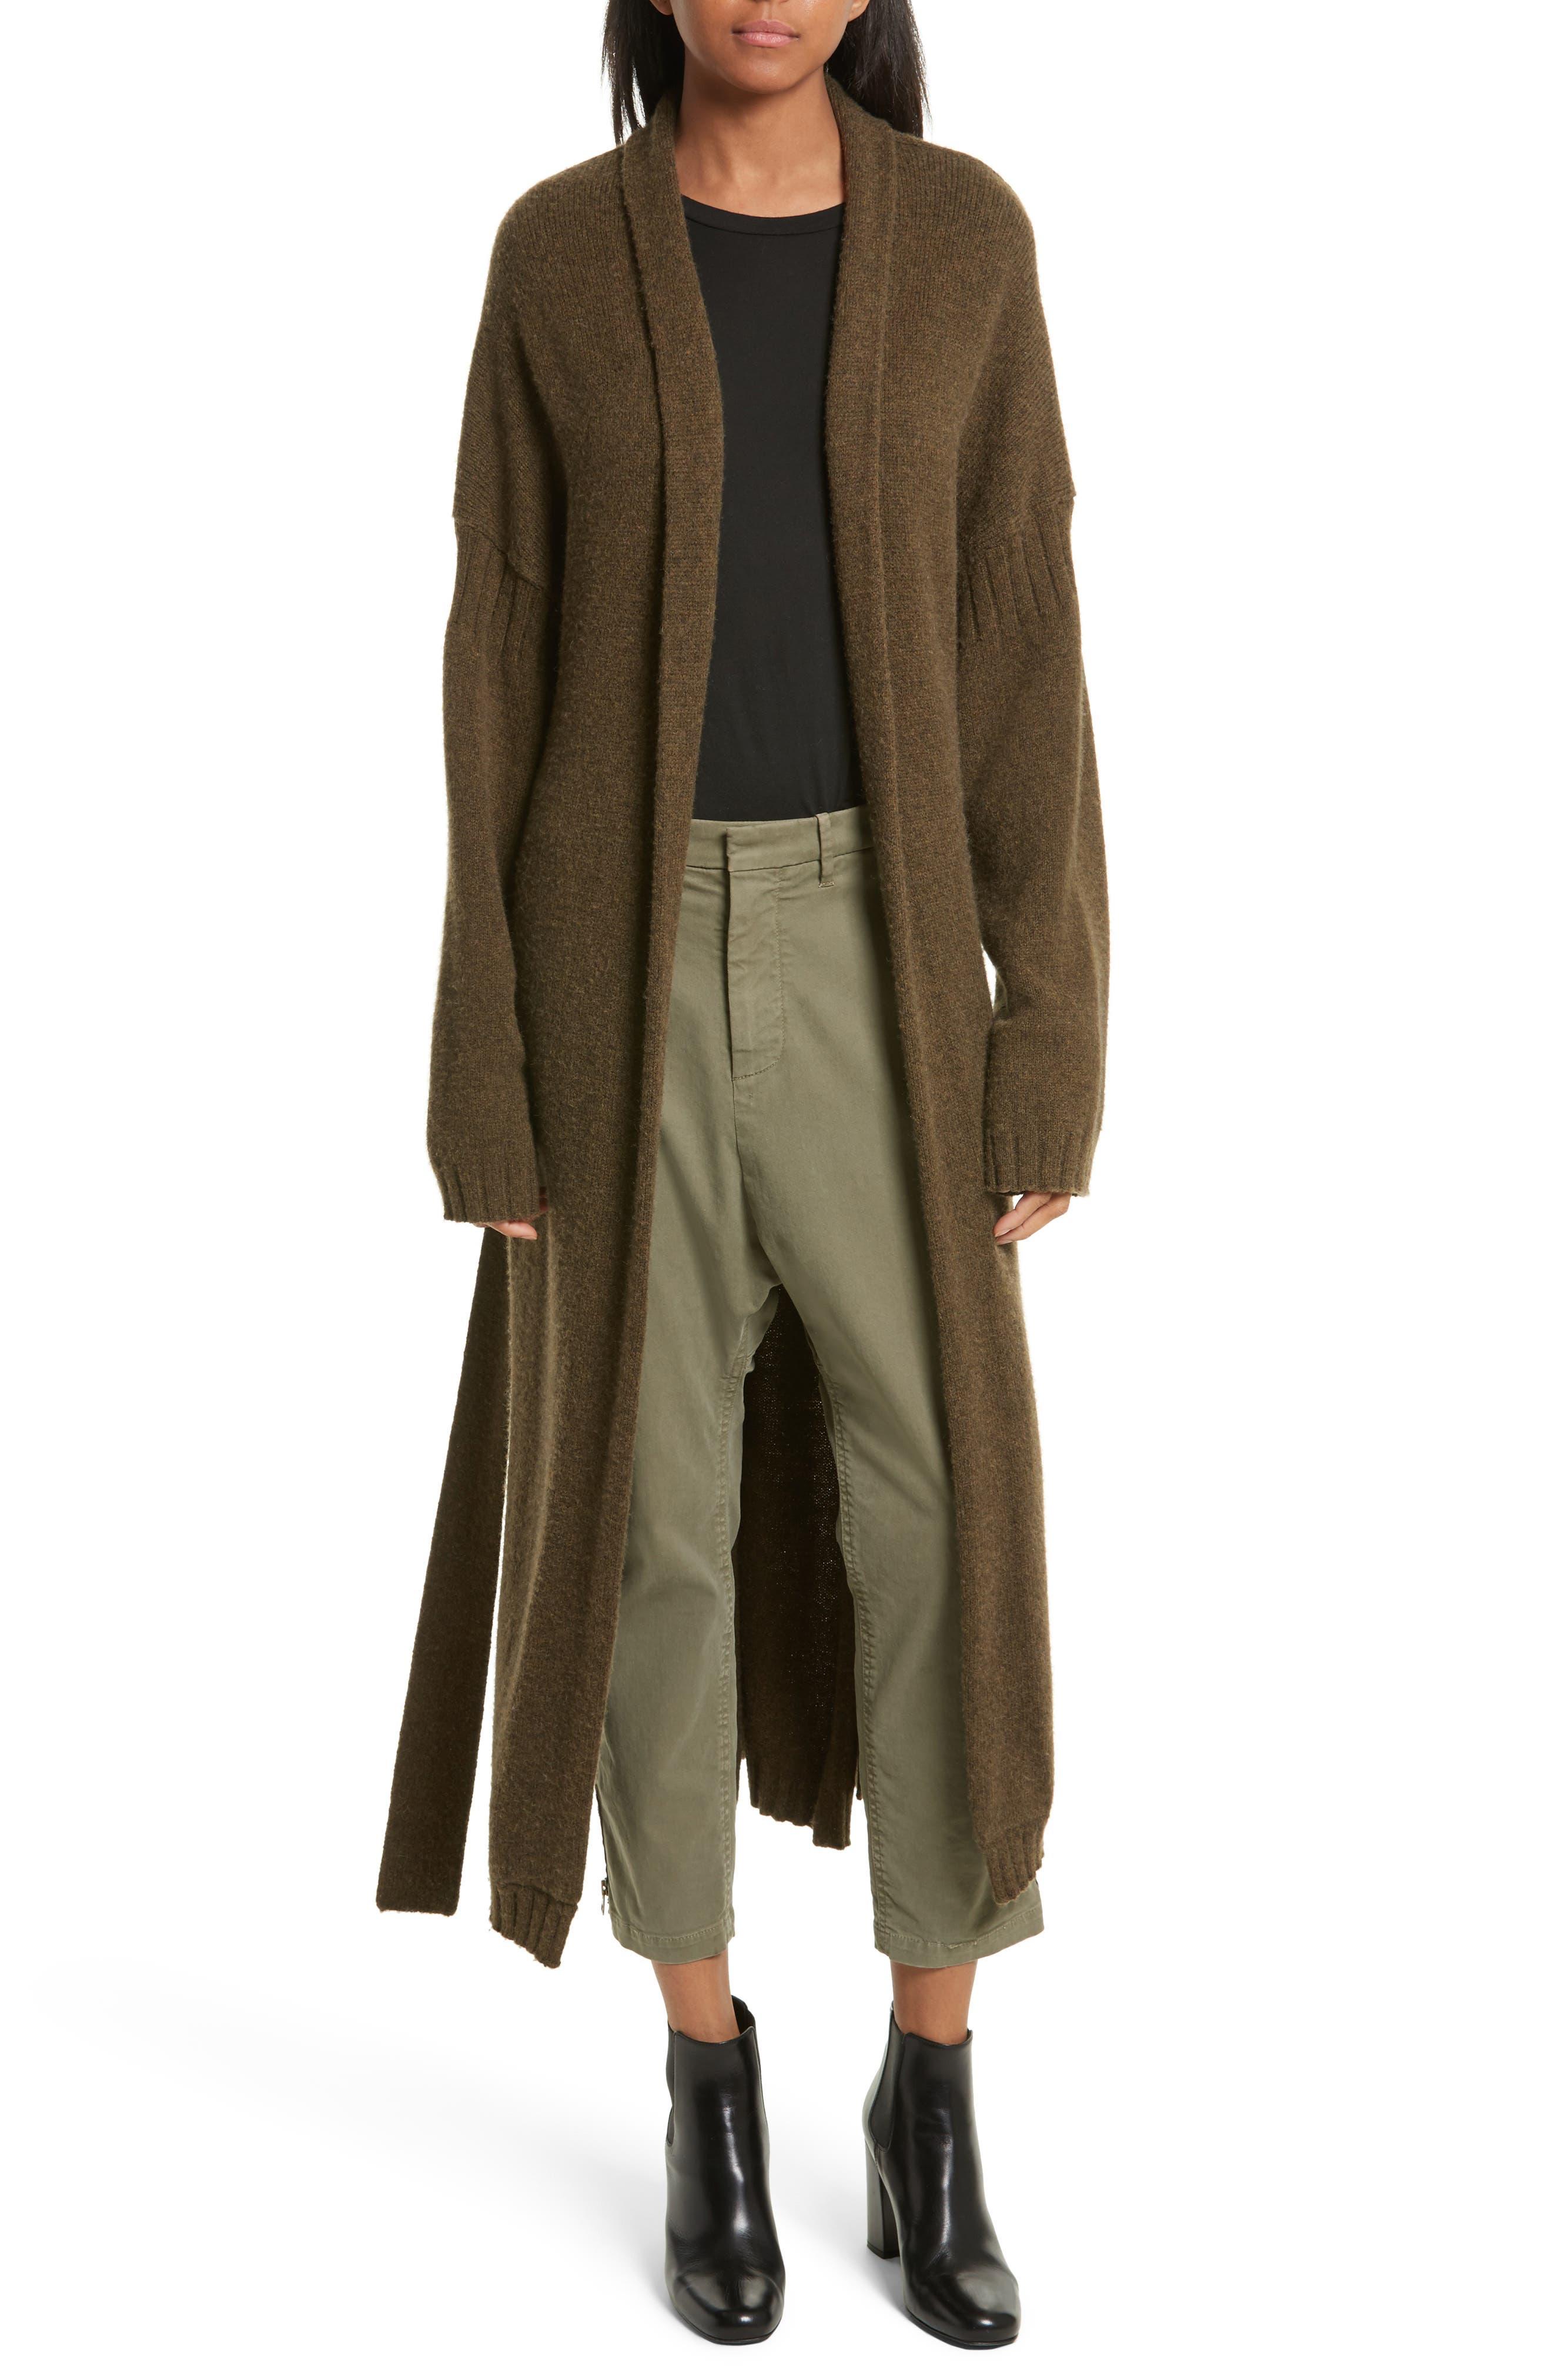 Kinsley Merino Wool Blend Cardigan,                         Main,                         color, Army Green